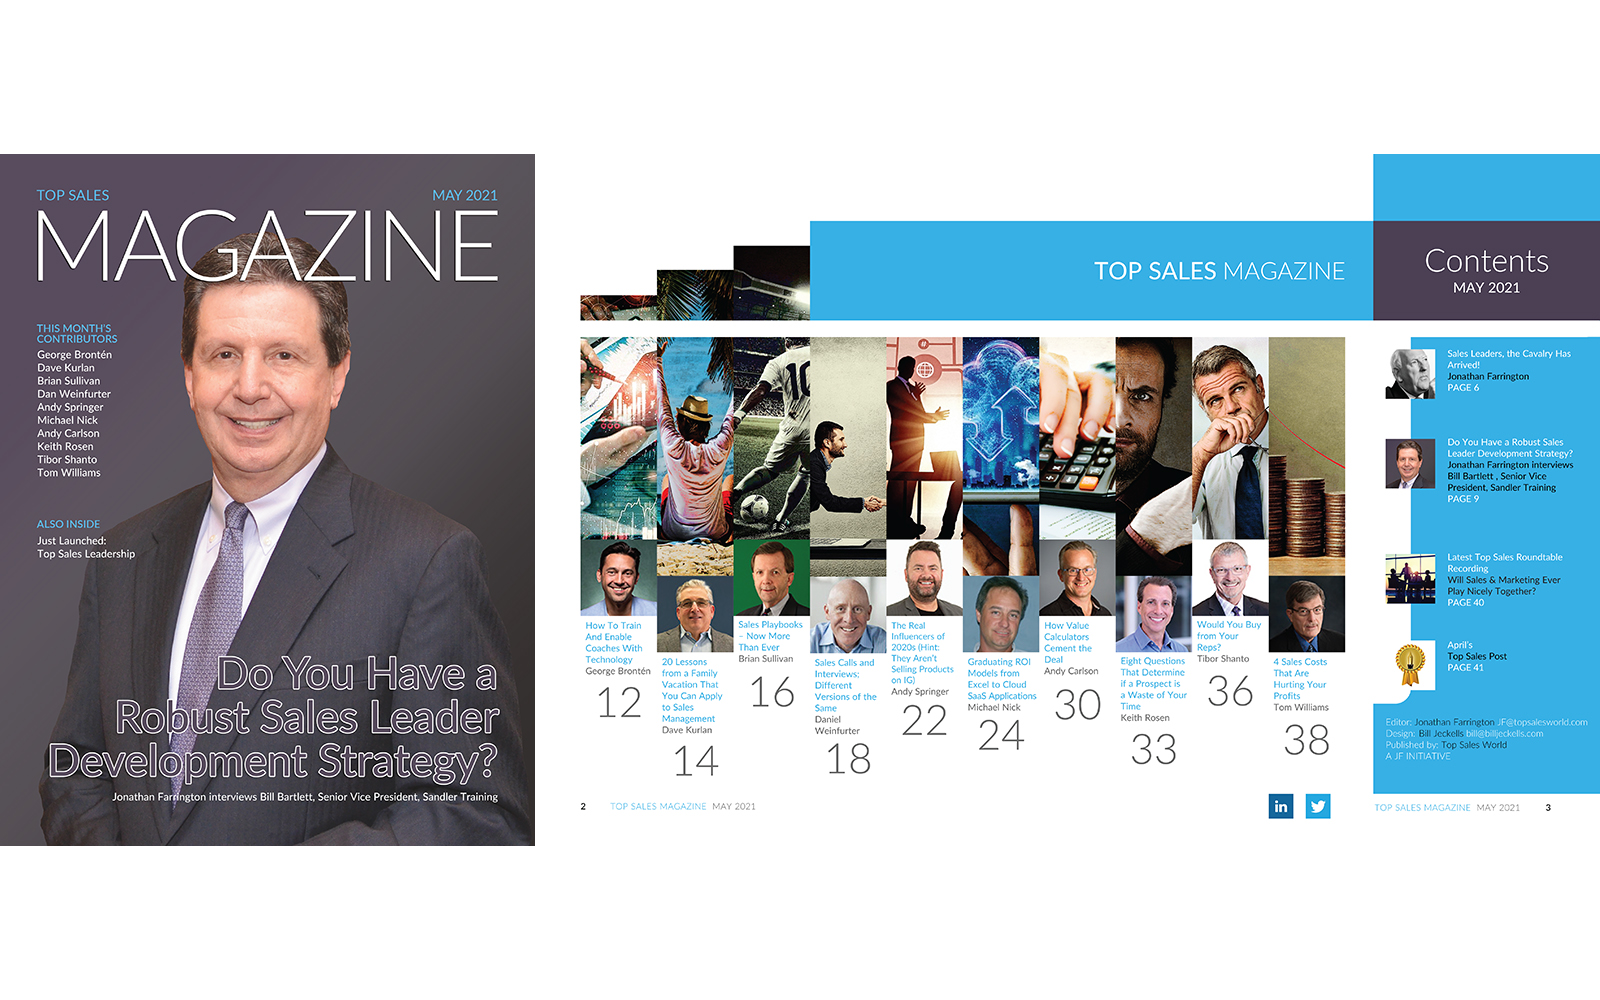 Top Sales Magazine May 2021